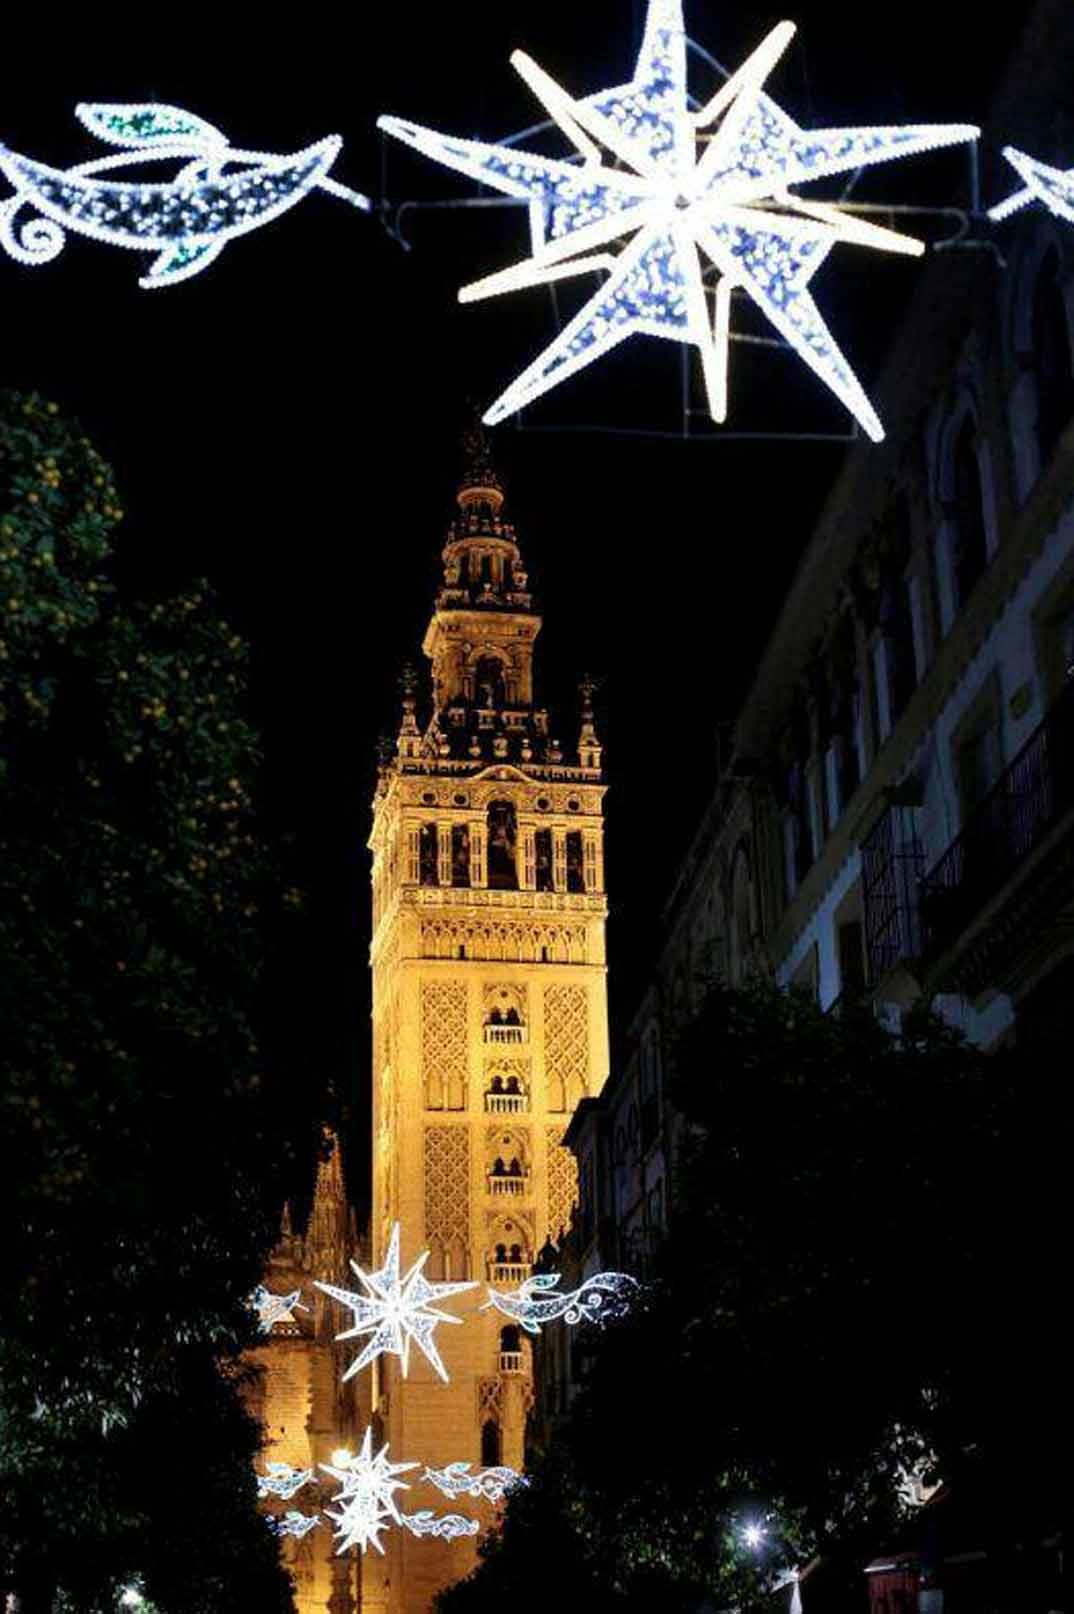 Sevilla - Turismo de Sevilla